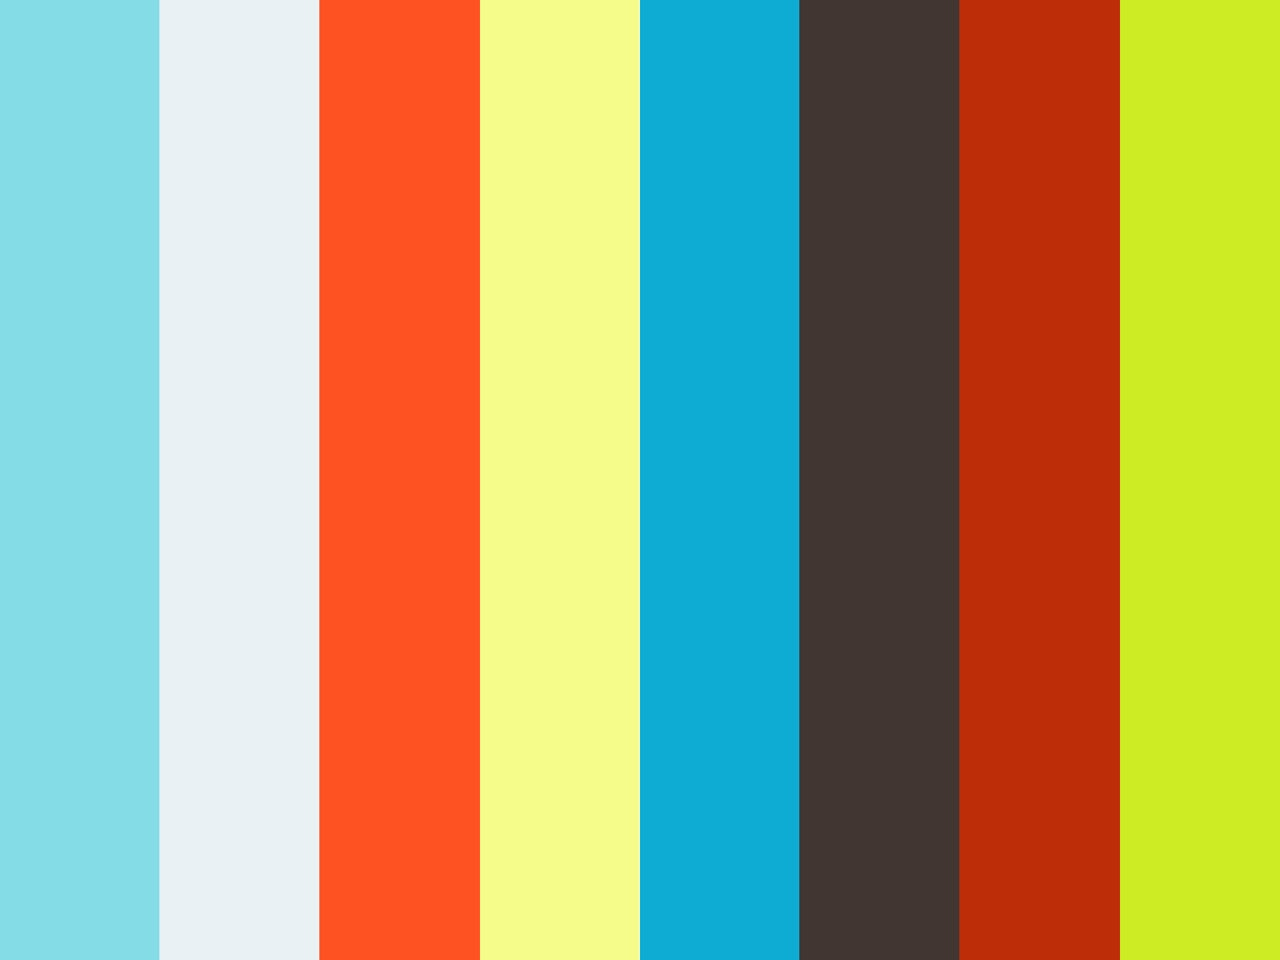 Blackmagic Ursa Mini Pro (Color Grade)